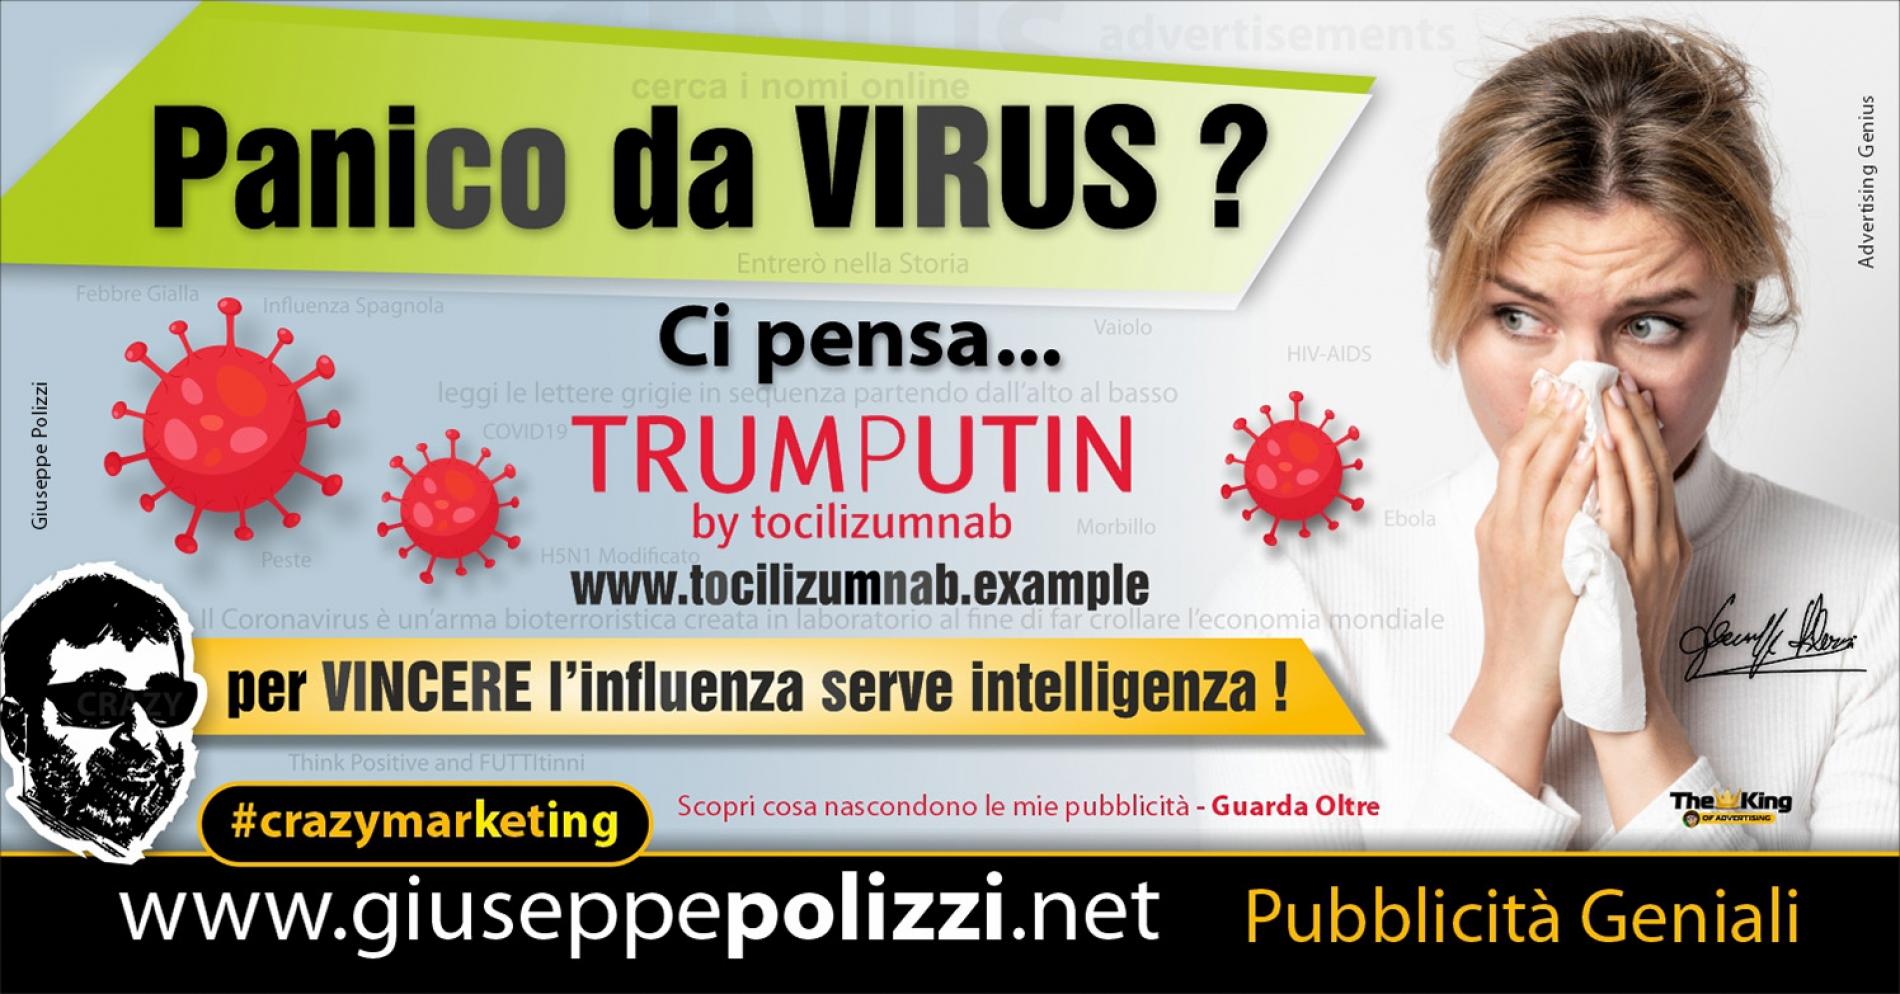 Giuseppe Polizzi Crazymarketing Panico da Virus Pubblicità geniali